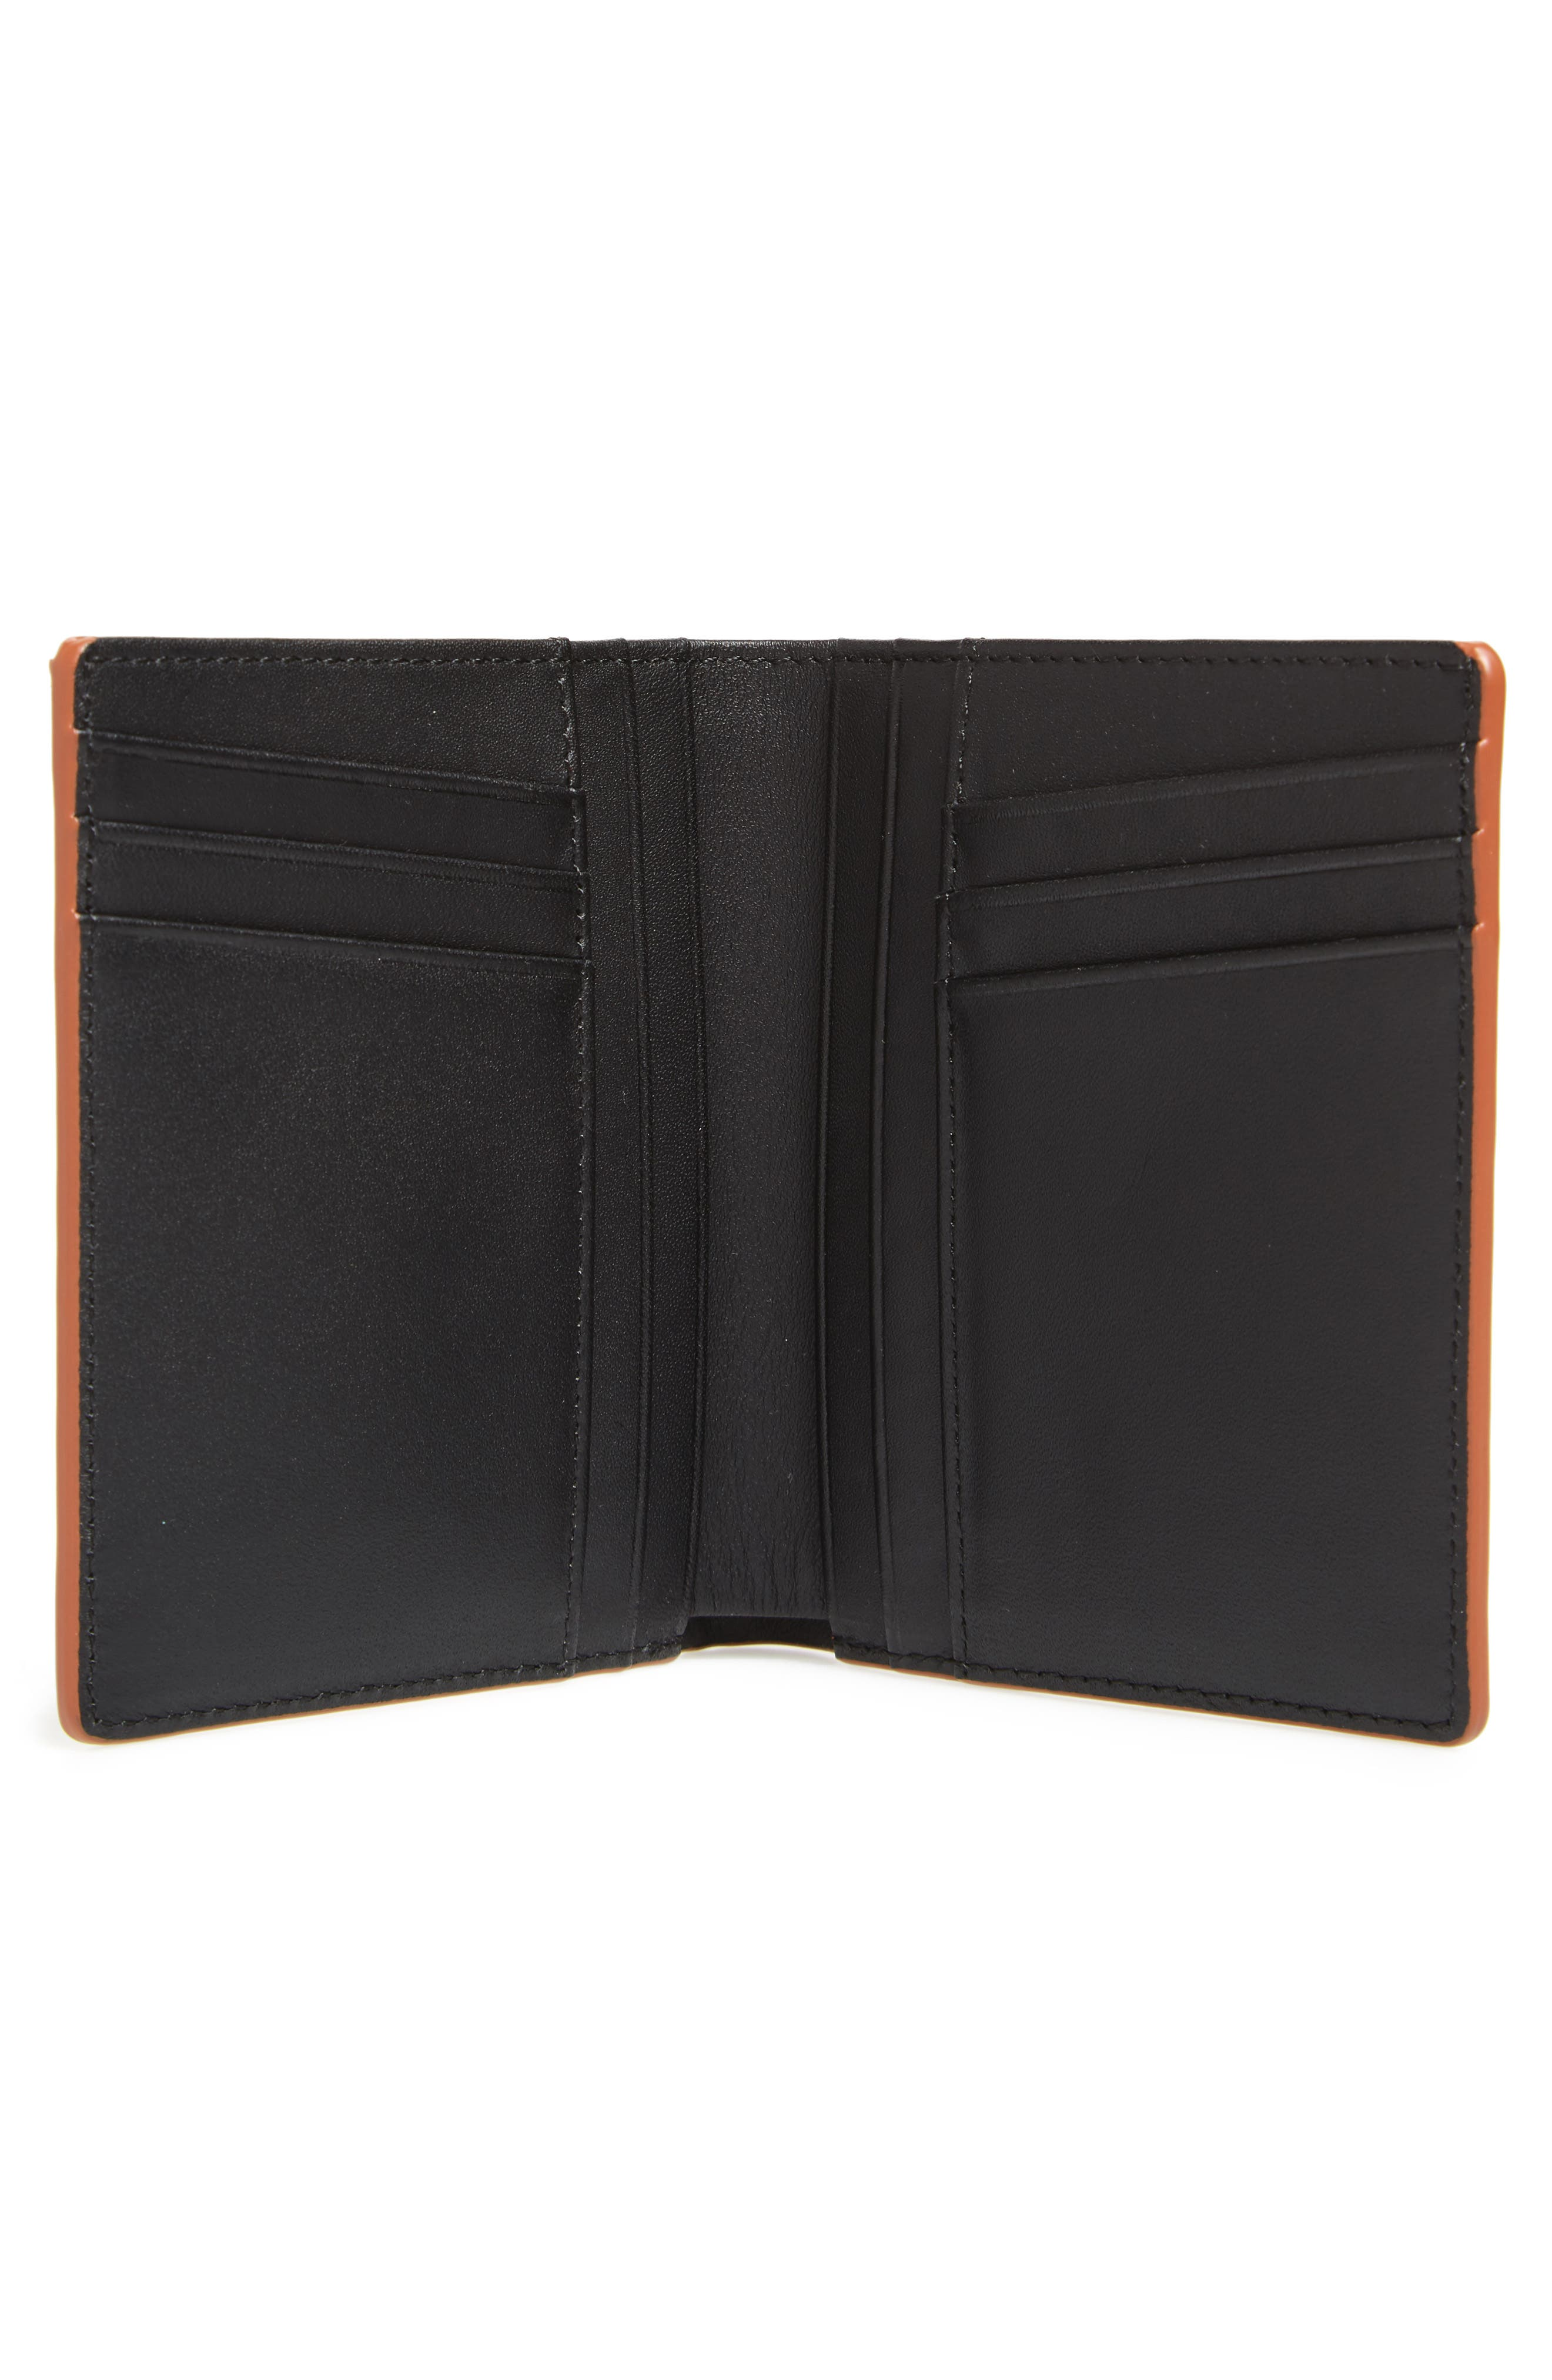 Bradley Bifold Leather Wallet,                             Alternate thumbnail 2, color,                             Multi Sand